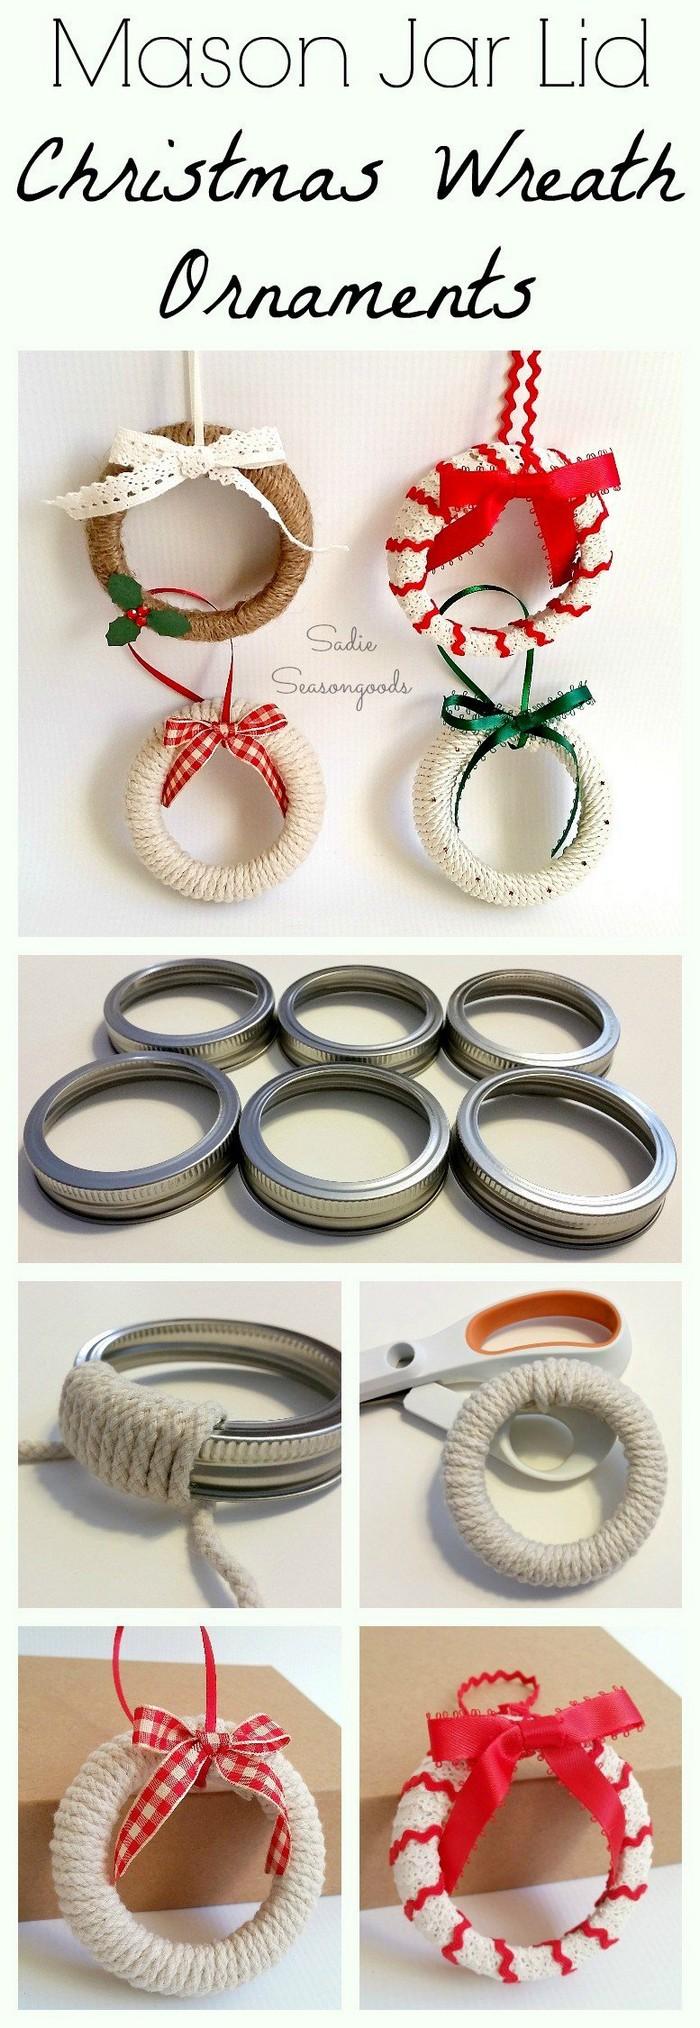 Mason Jar Lid Wreath Ornaments 25 Interesting Ideas to Make Easy Christmas Crafts